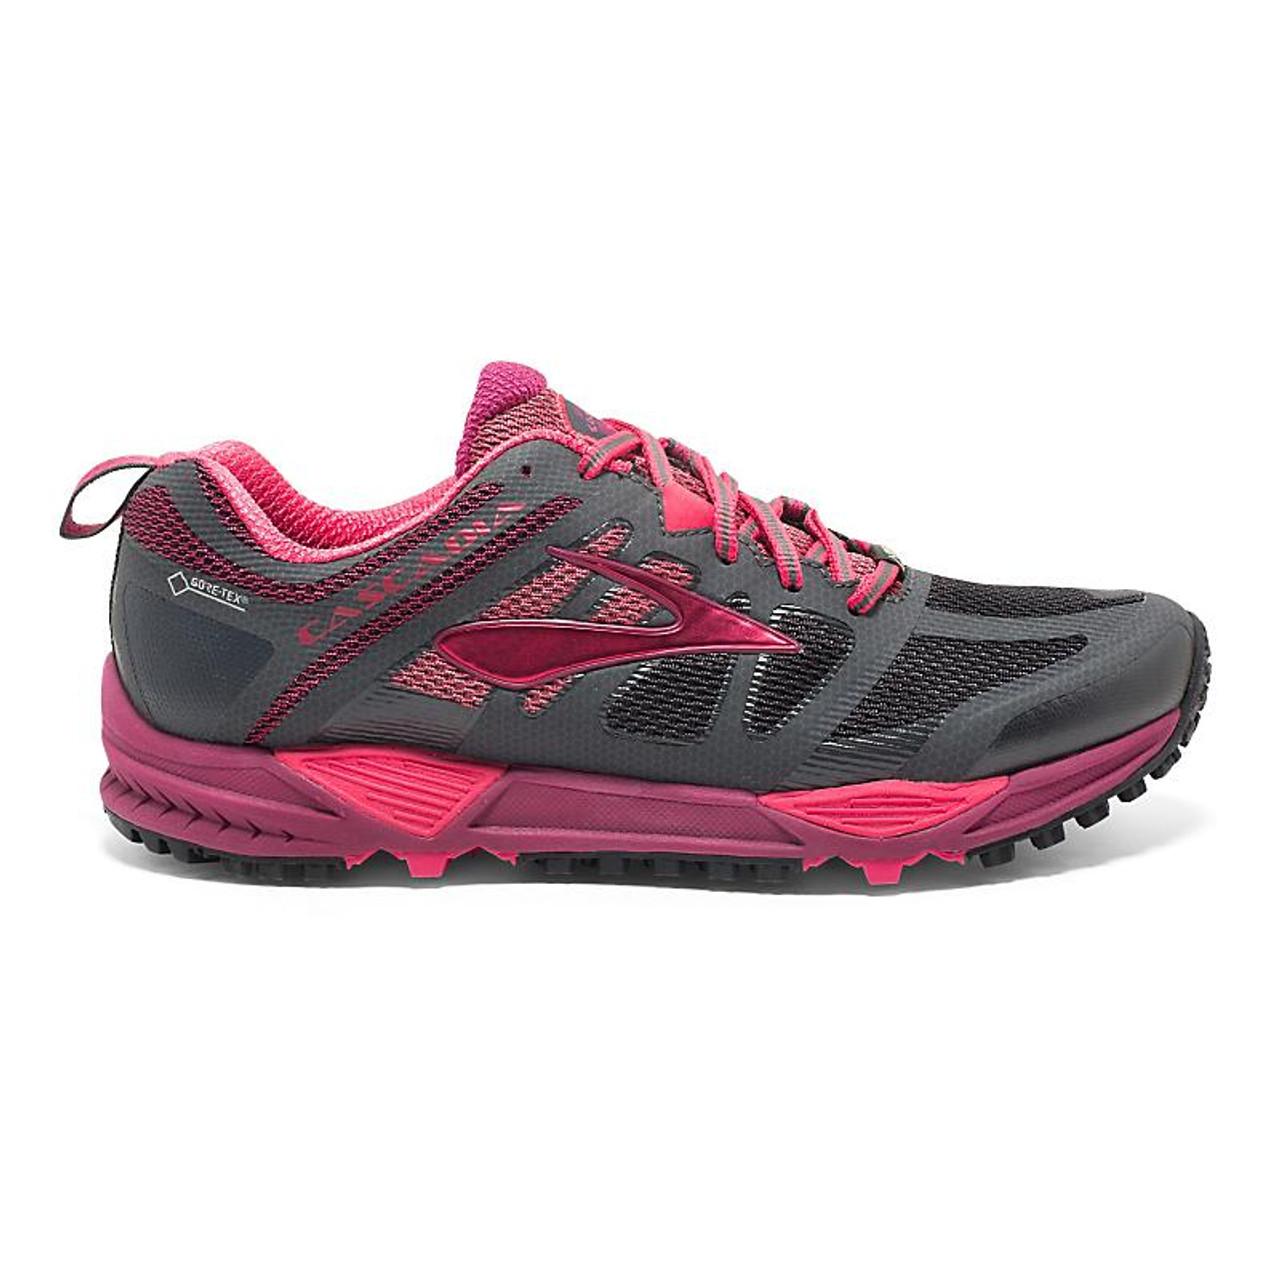 987e2c3b1cc11 Women s Brooks Cascadia 11 GTX Trail Running Shoe